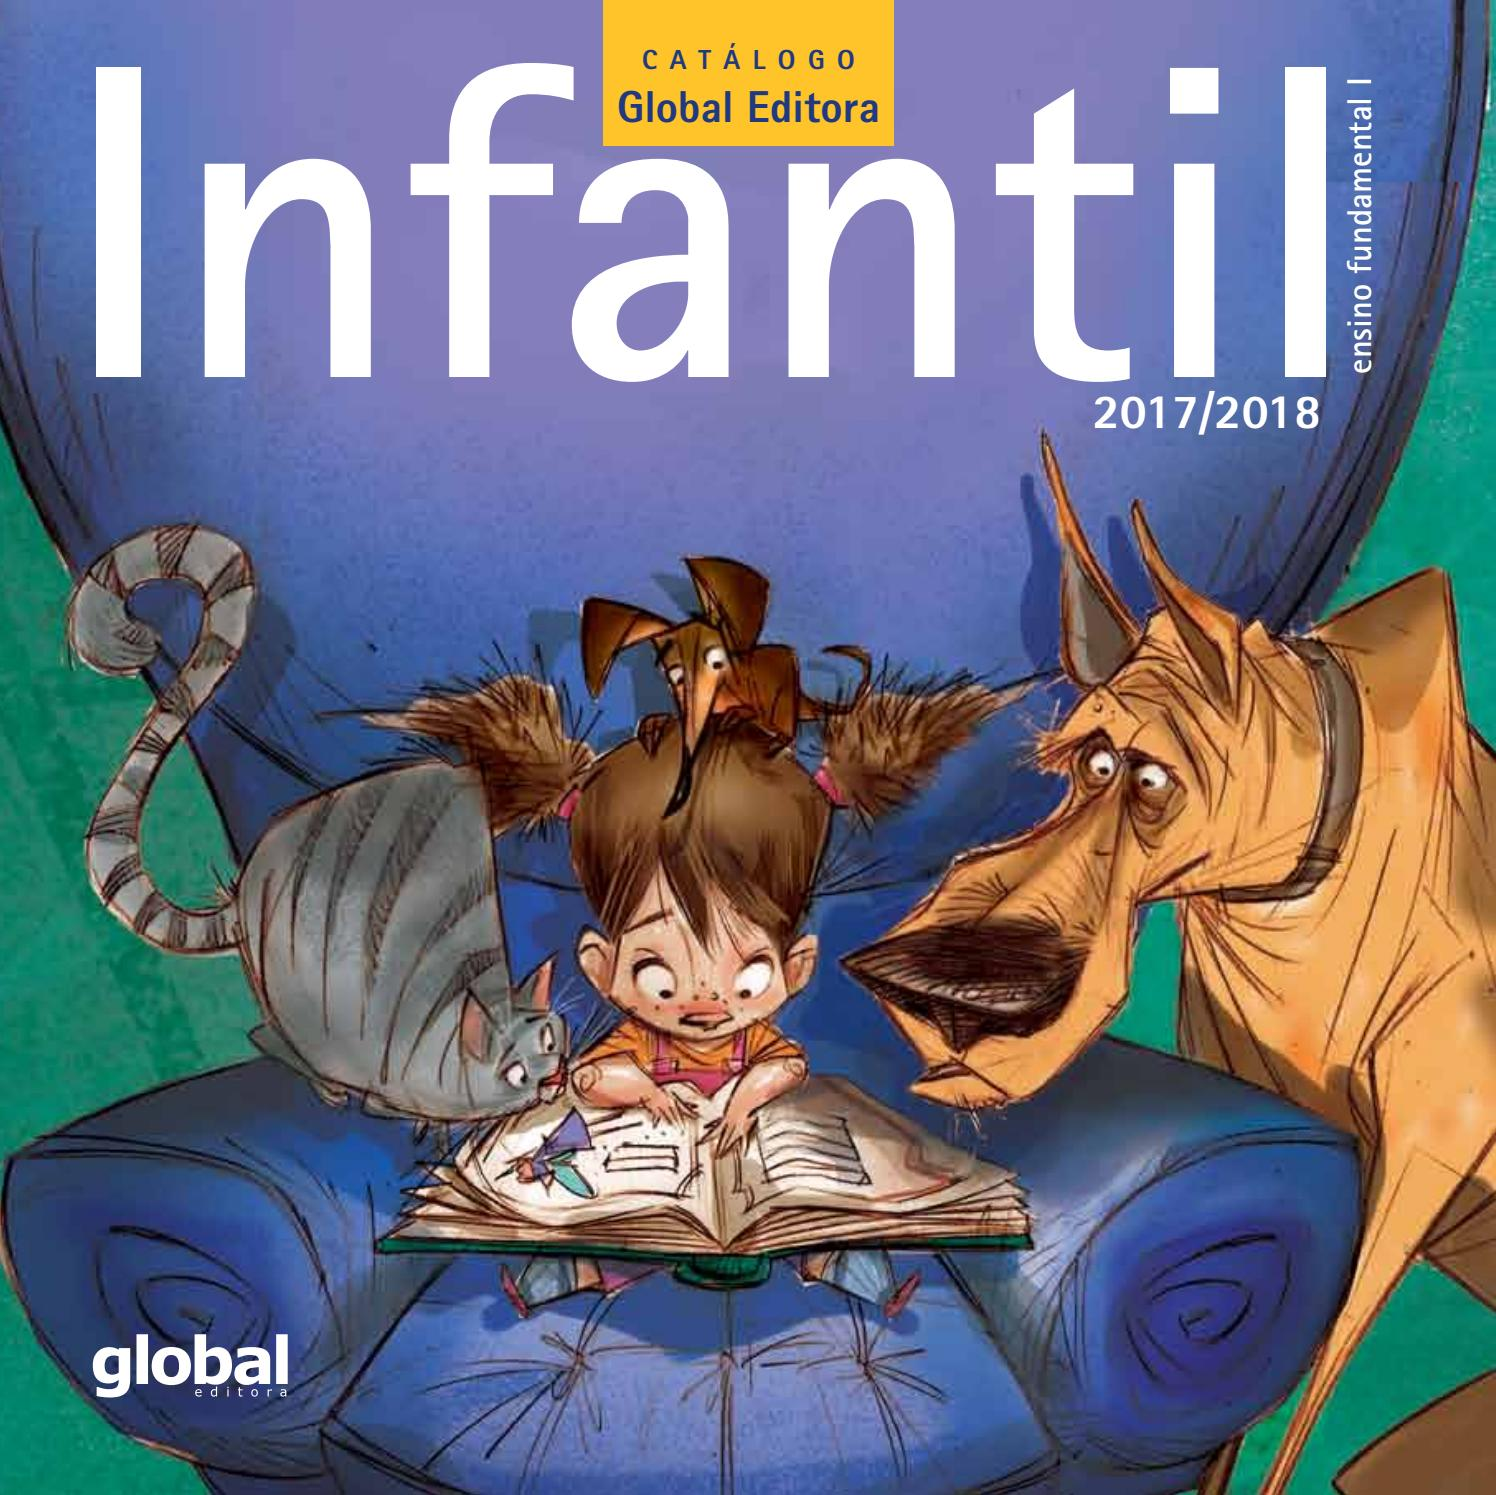 70085a1d5c50a Catálogo Infantil - Fundamental I - 2017 2018 by Global Editora - issuu